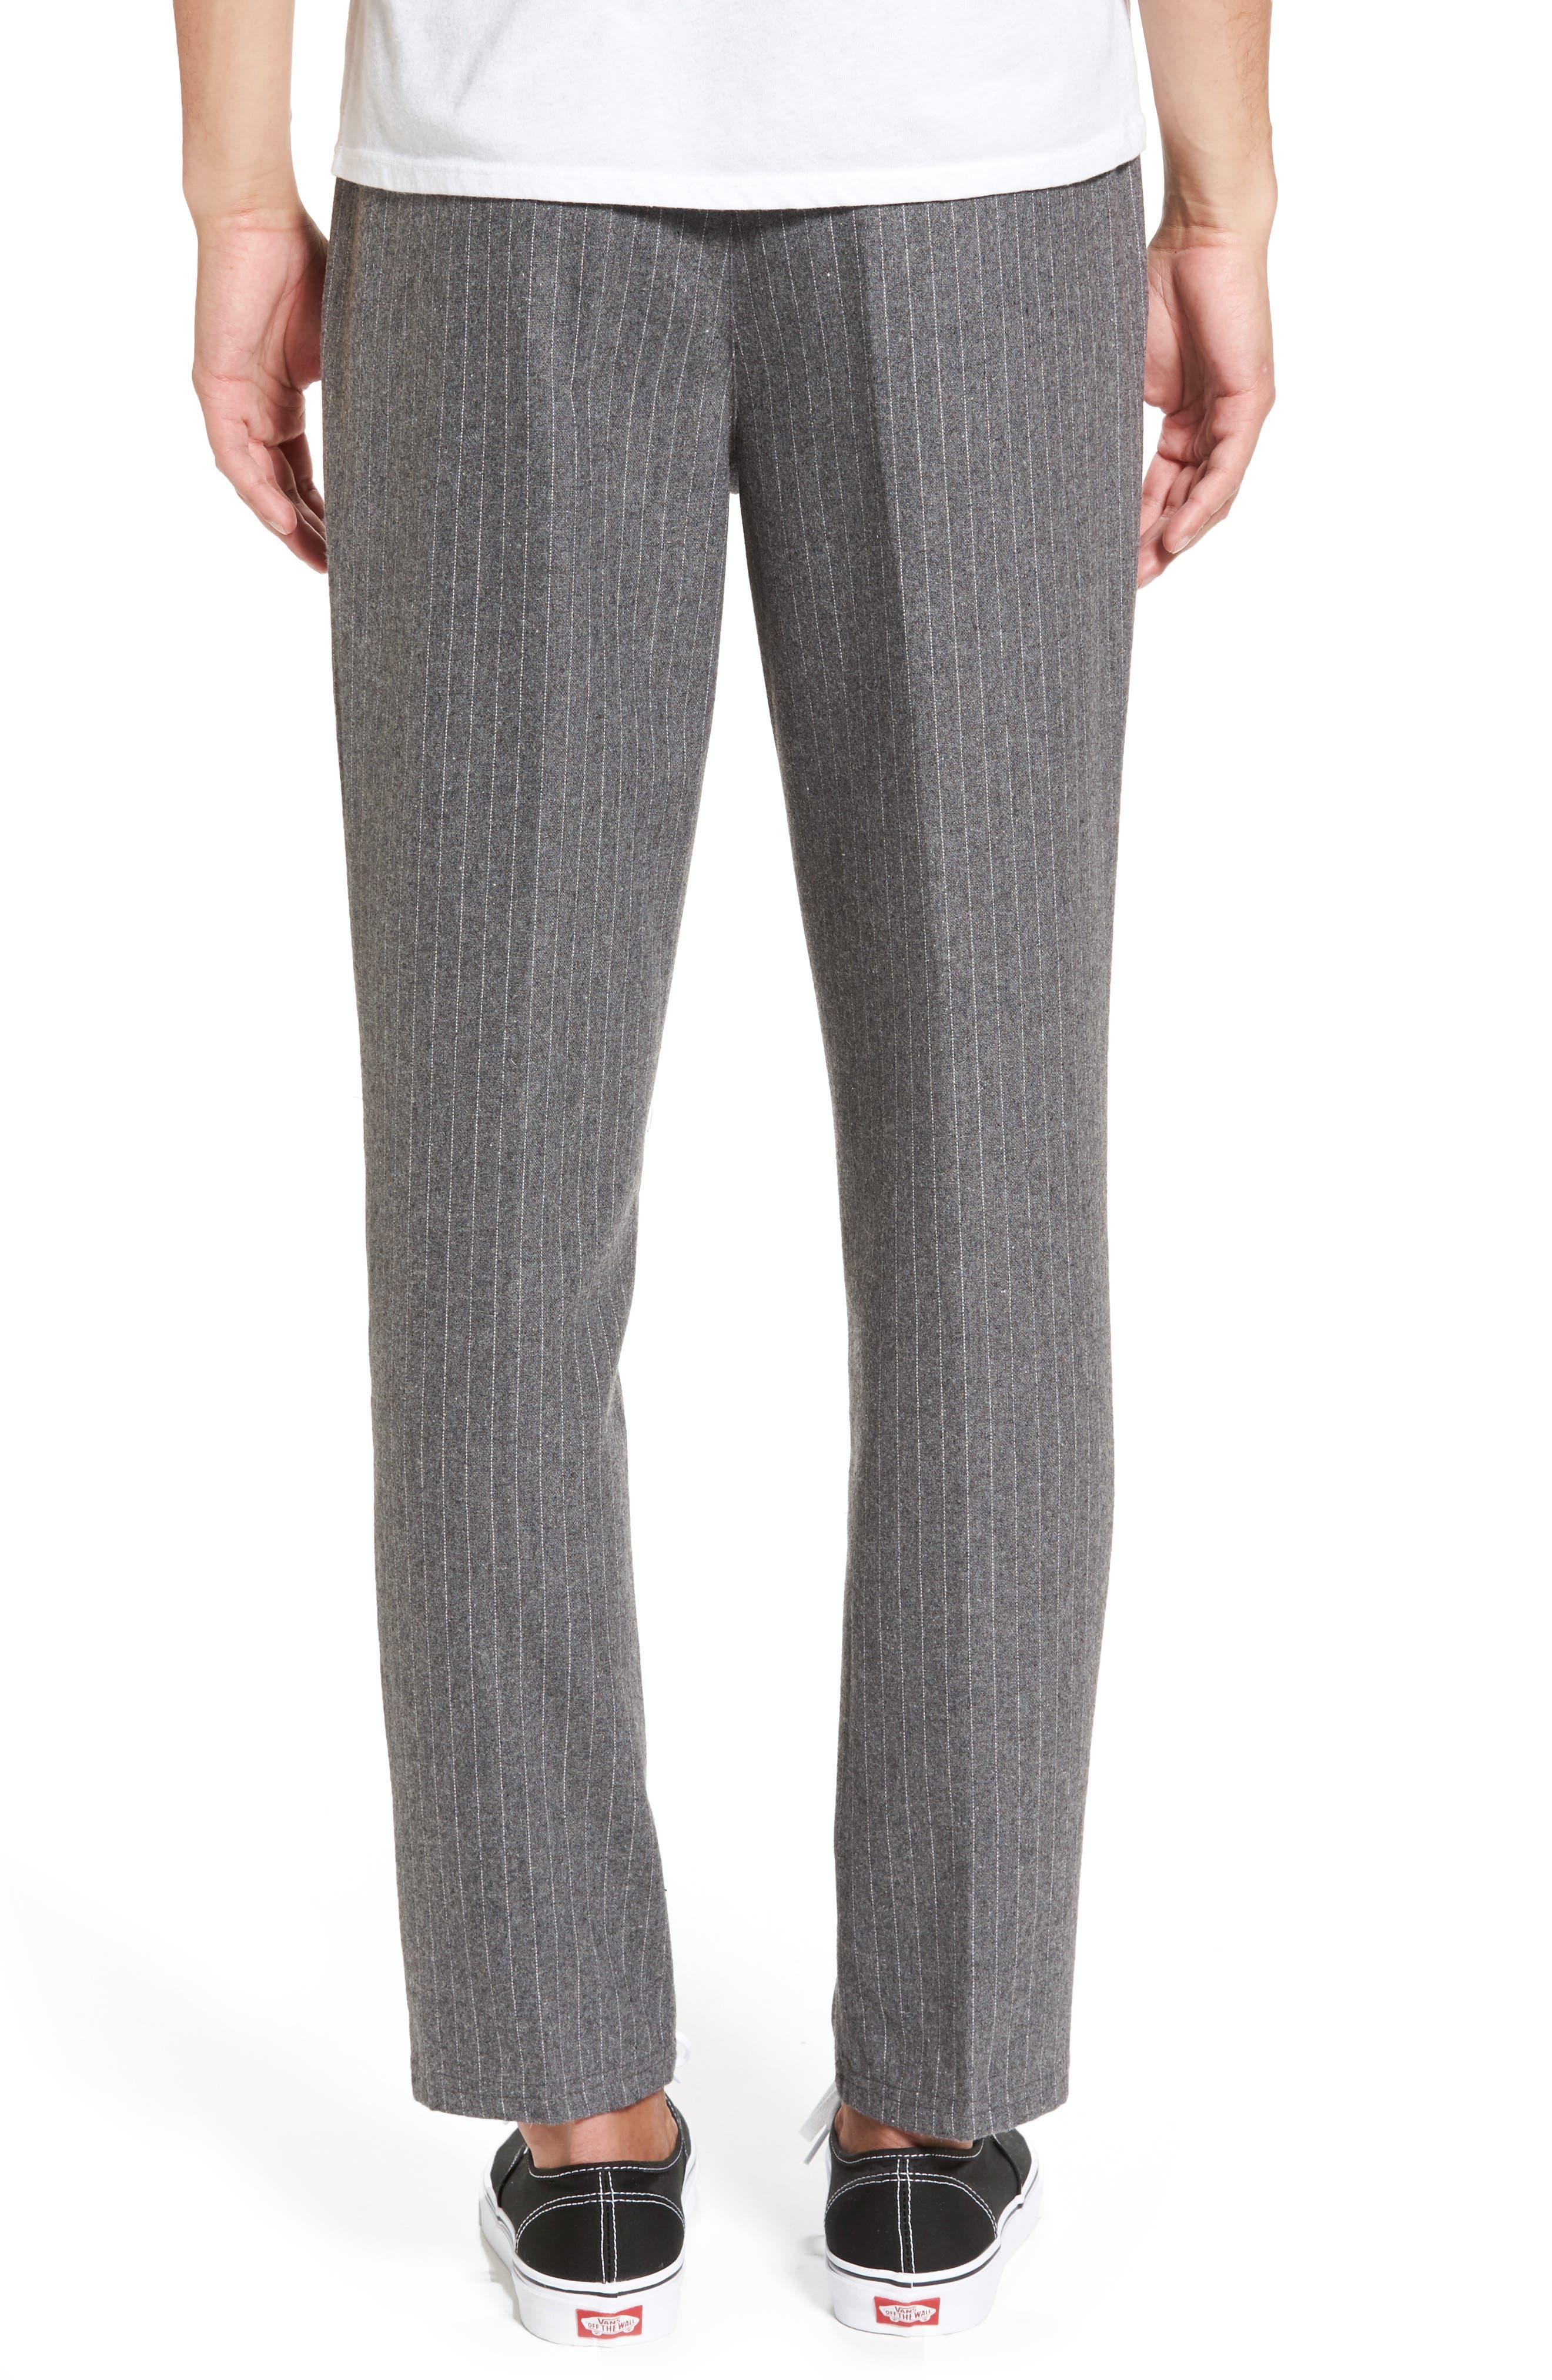 Pennyworth Pants,                             Alternate thumbnail 2, color,                             Charcoal Pinstripe